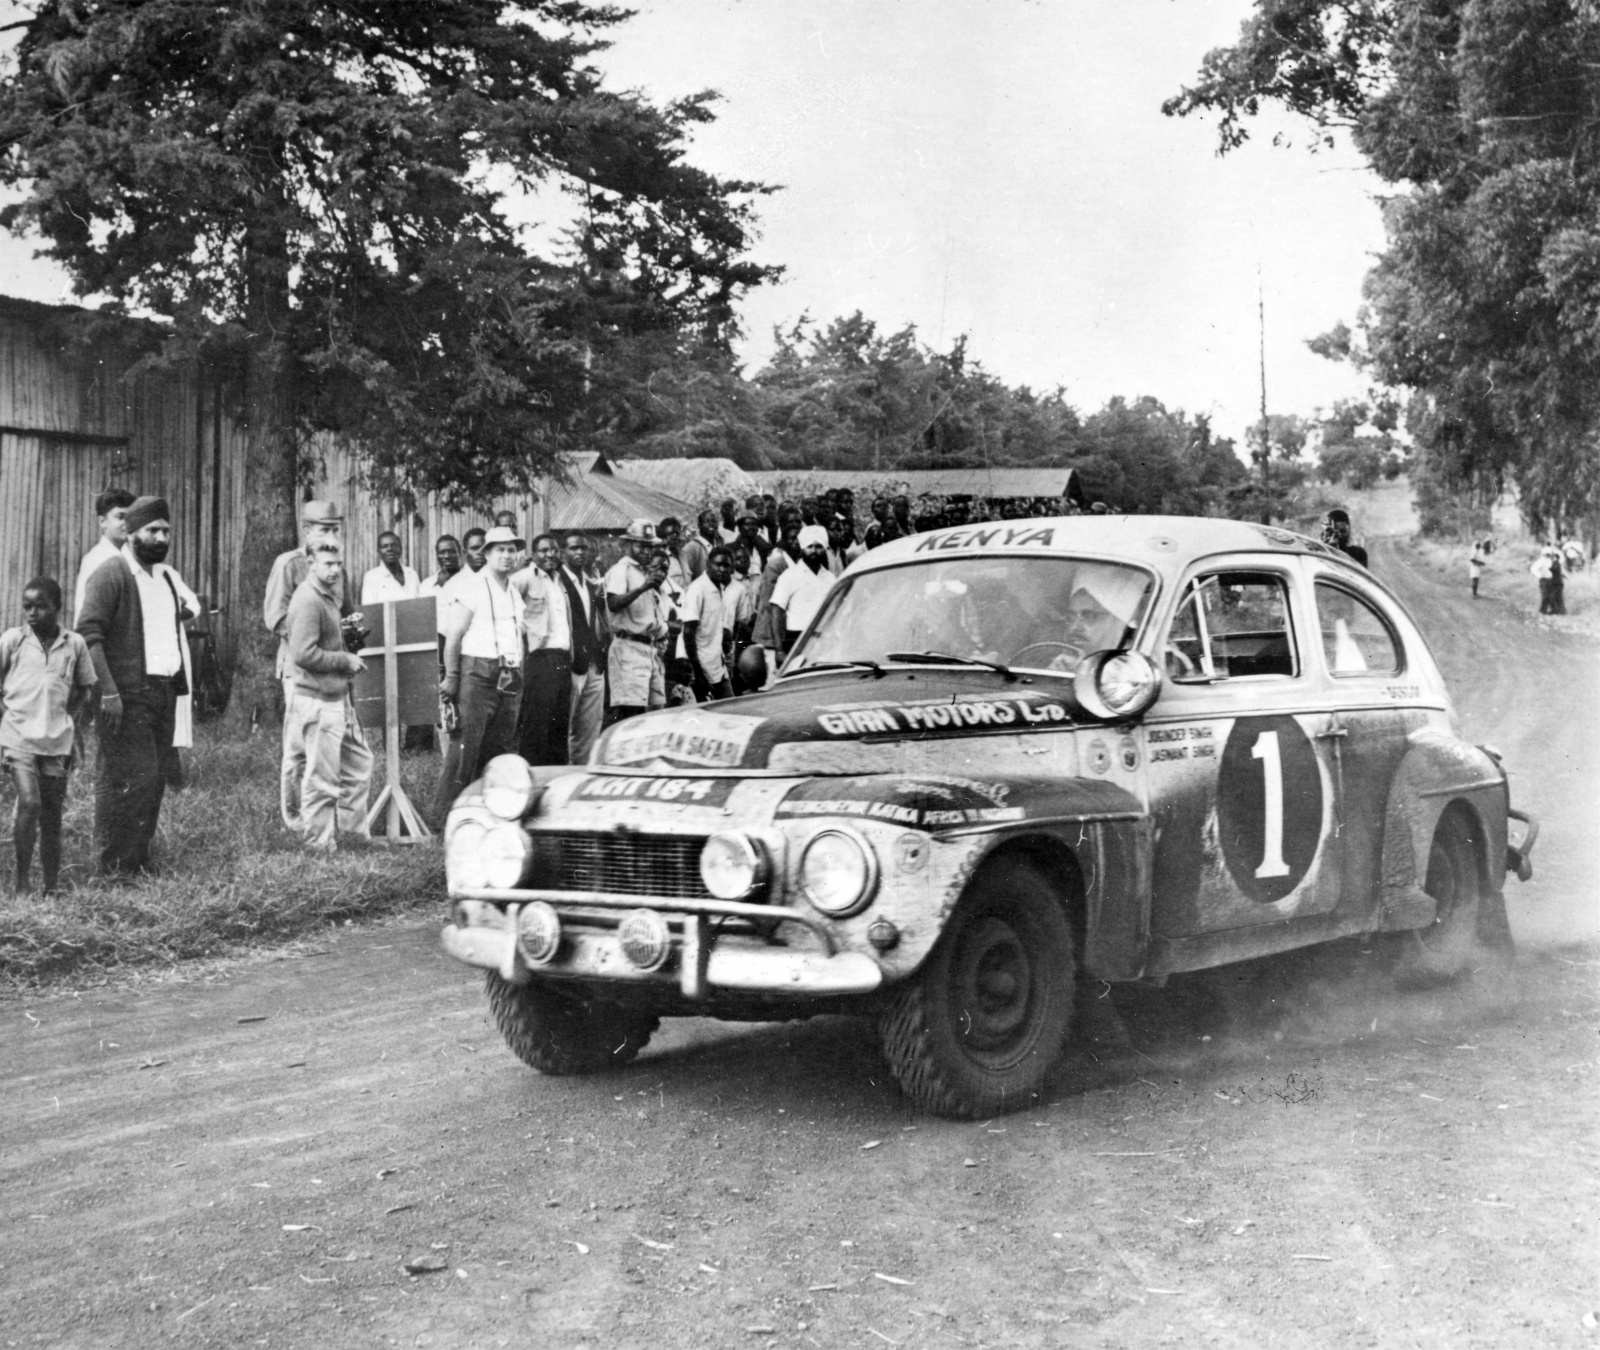 Volvo Katterug wint Safari Rally – in 1965